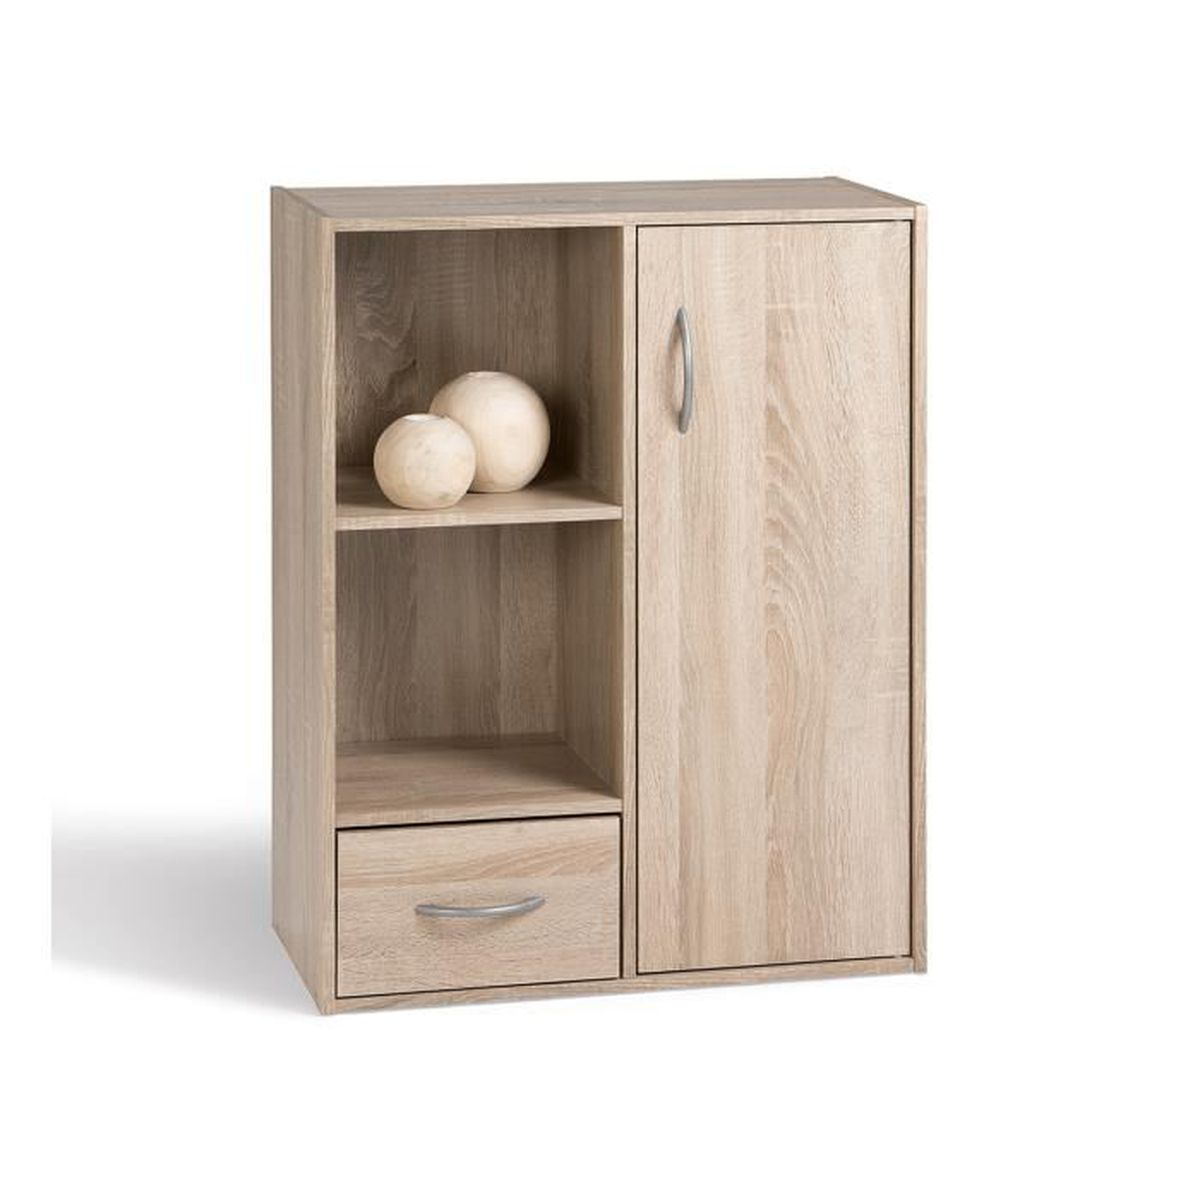 100 meubles tv meubles rangements temahome meuble for Meuble tv drummondville